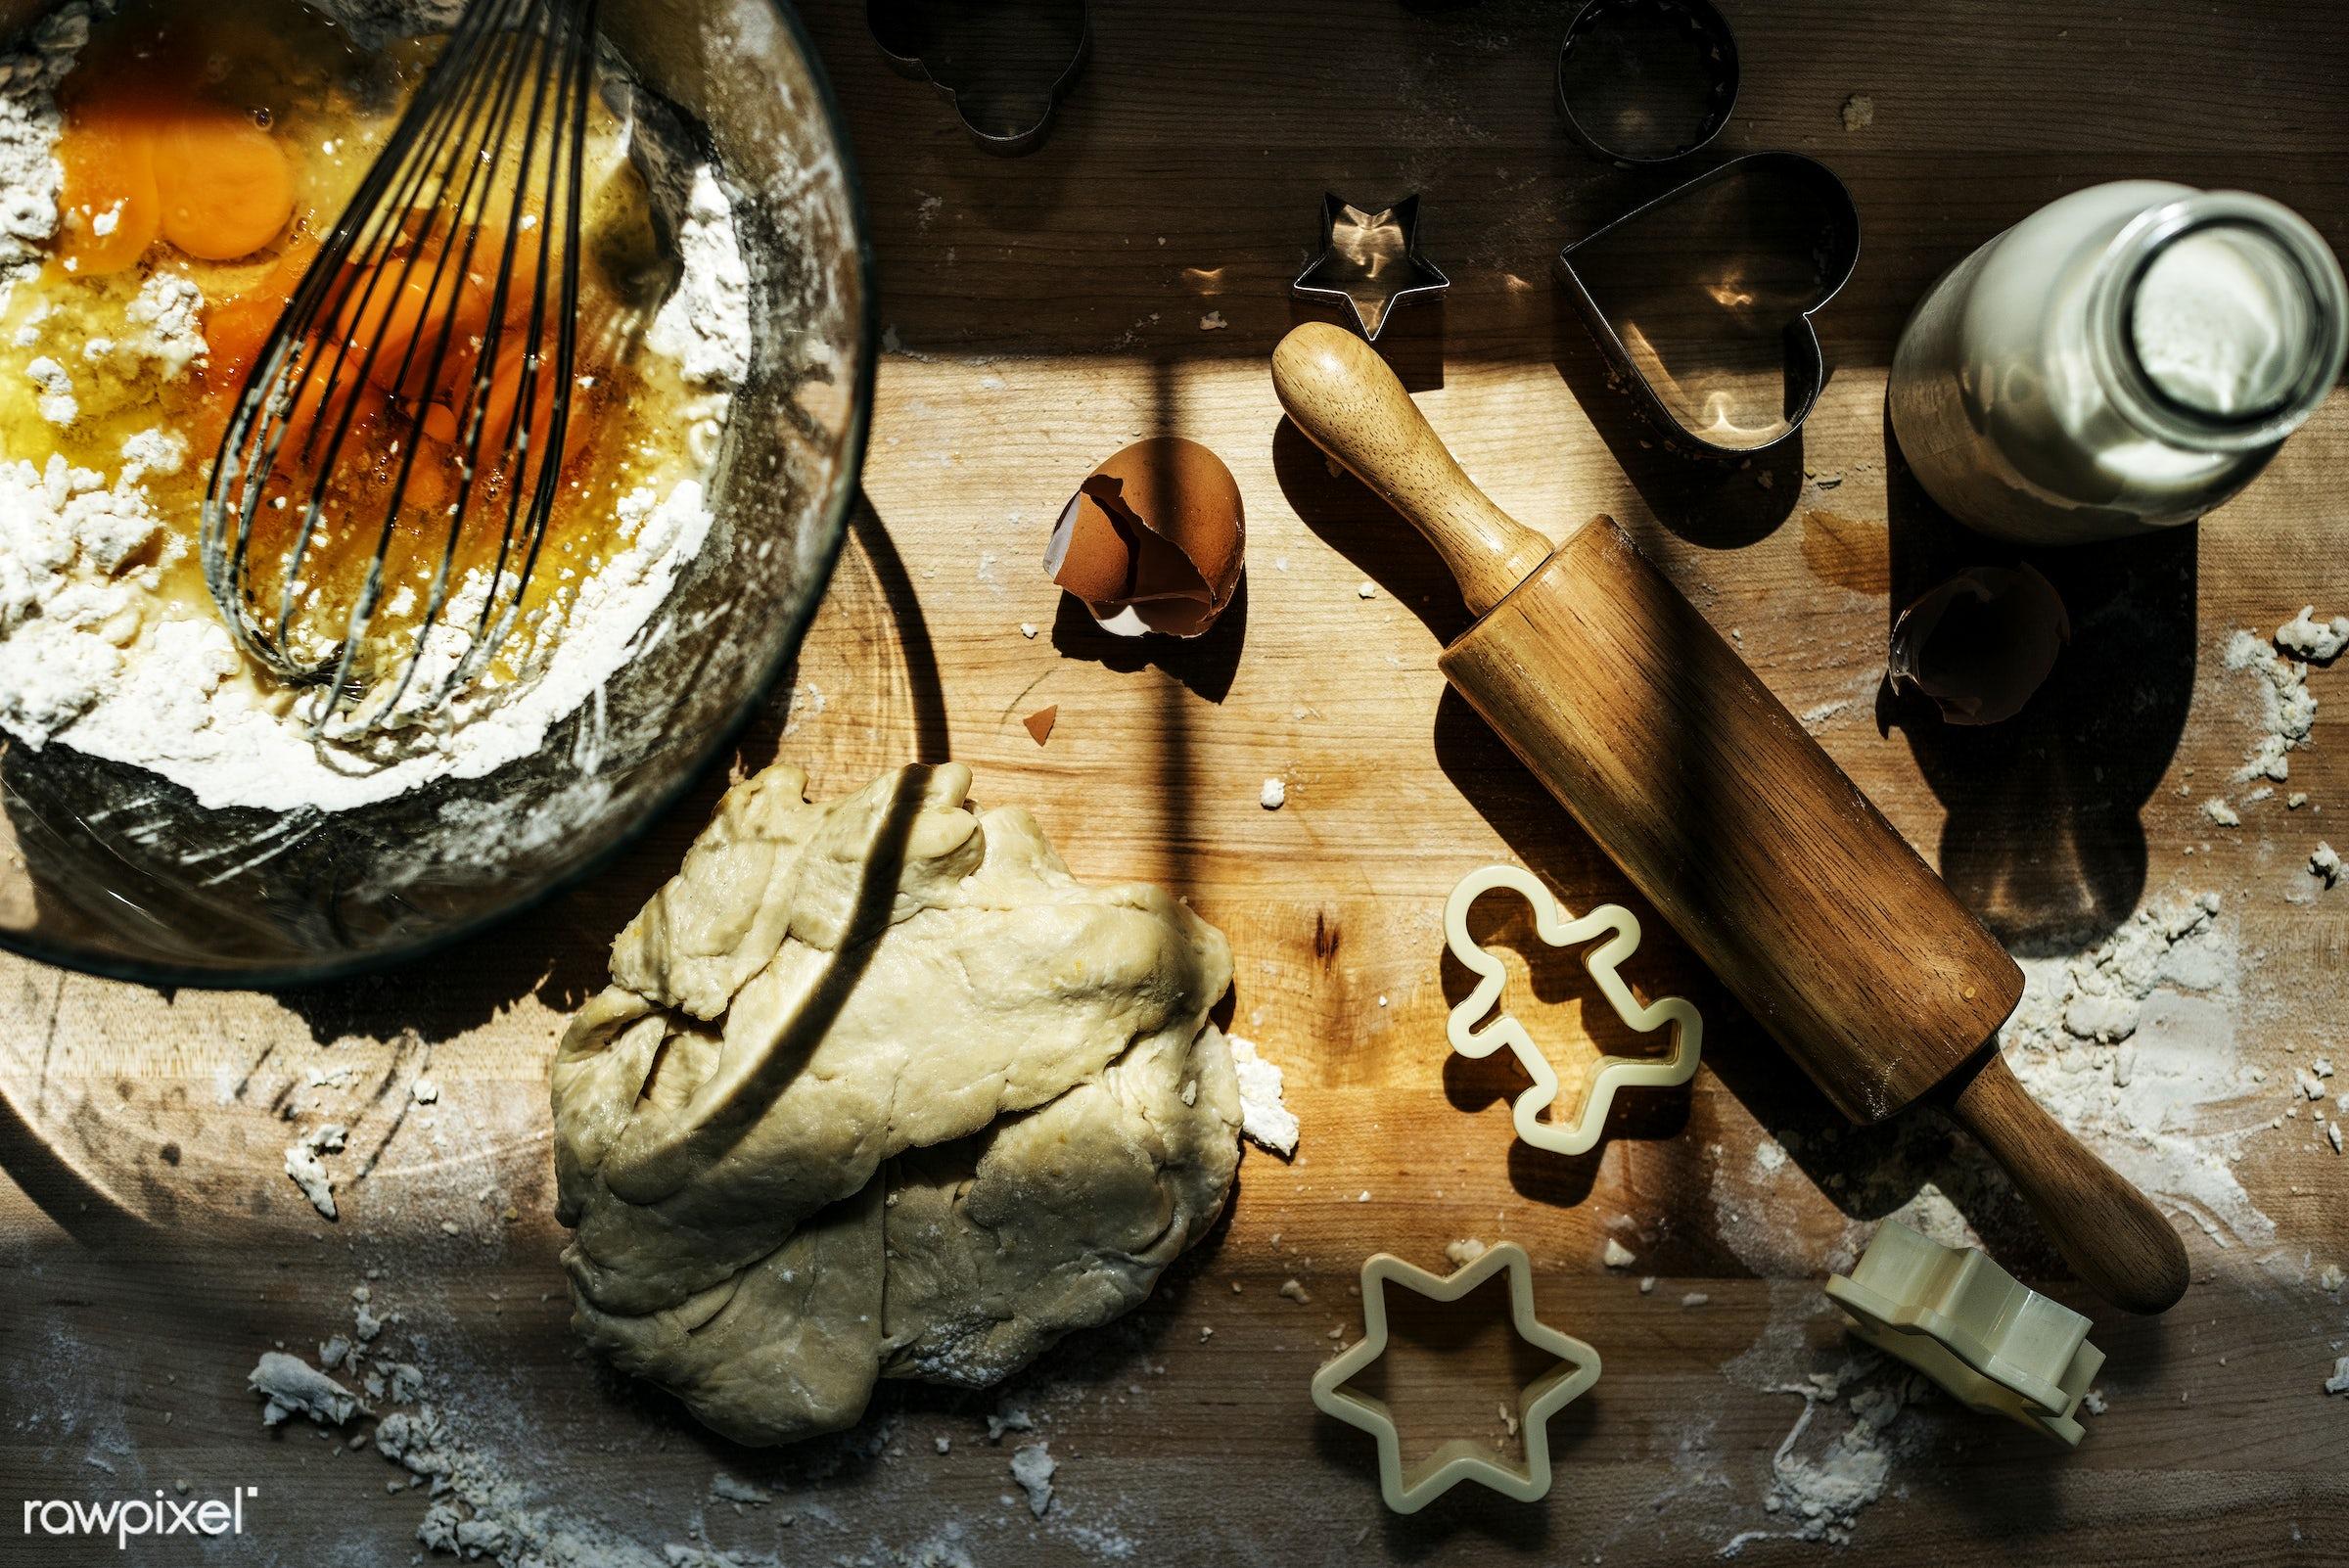 Baking preparation - bakery, cake, baker, bake, bake shop, baking, butter, closeup, cookies, cooking, dessert, dough,...